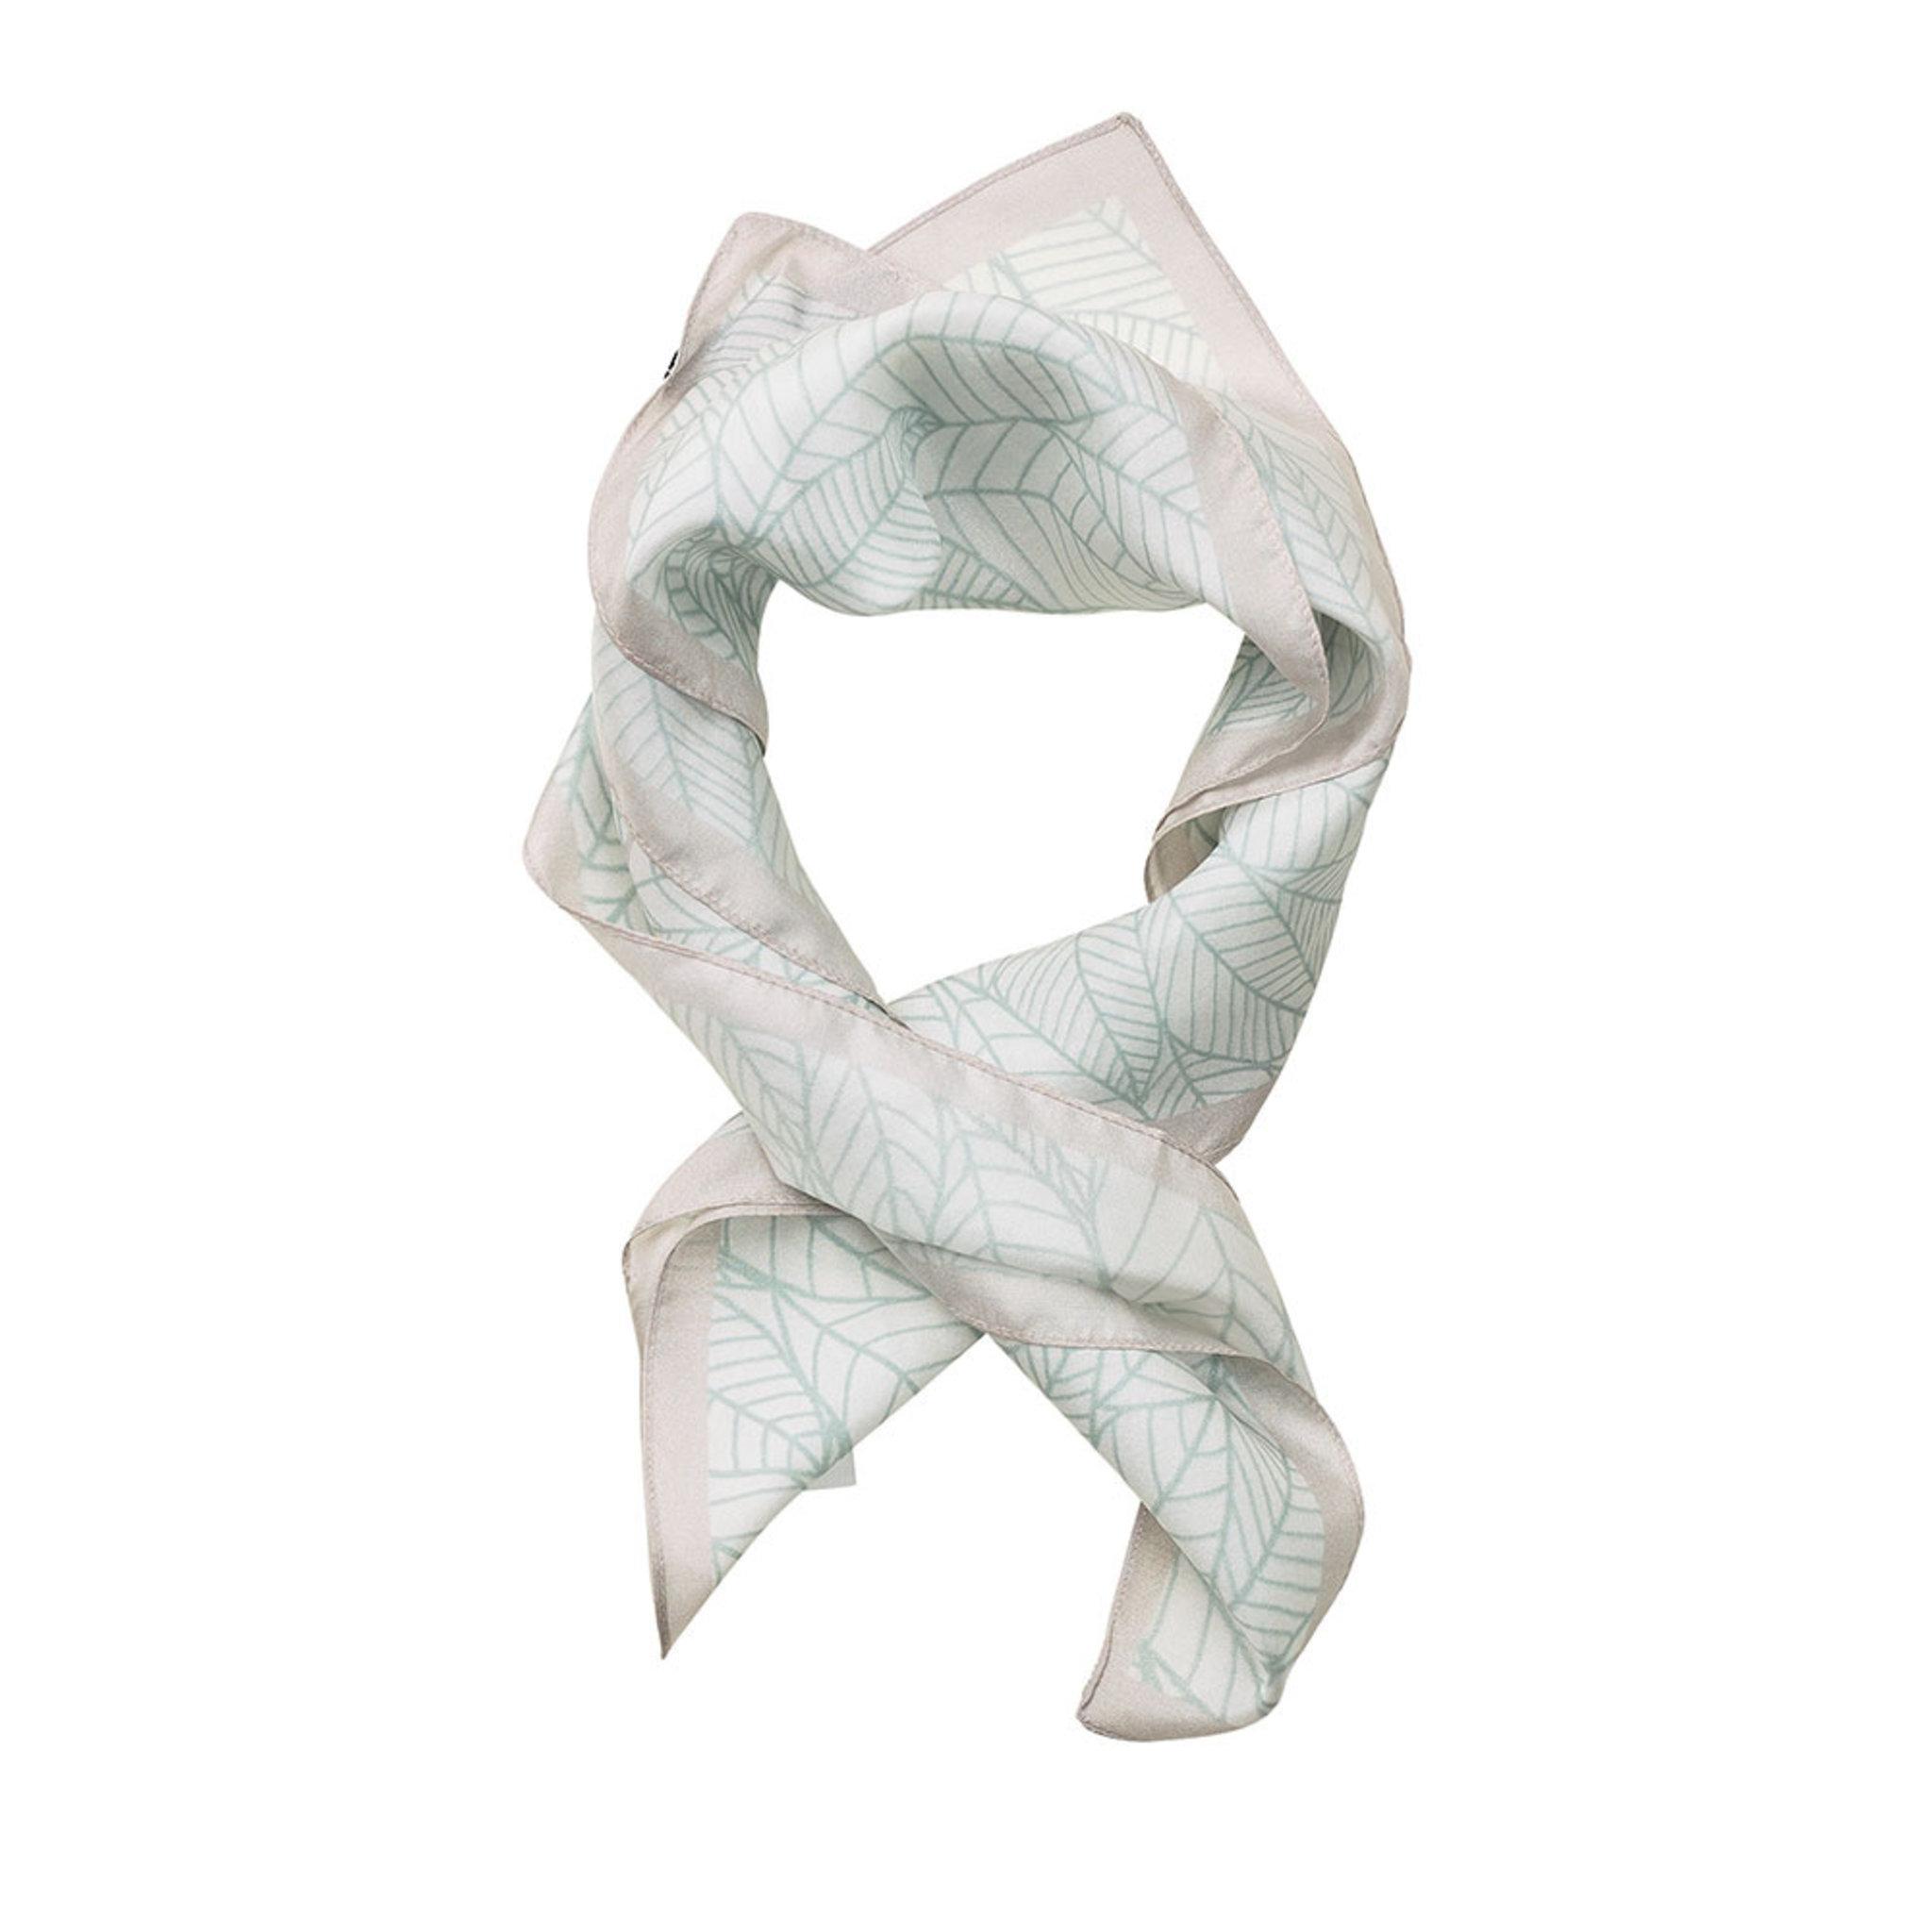 Silk Scarf - Halsdukar   scarves - Köp online på åhlens.se! 1561ab8ba1fd4